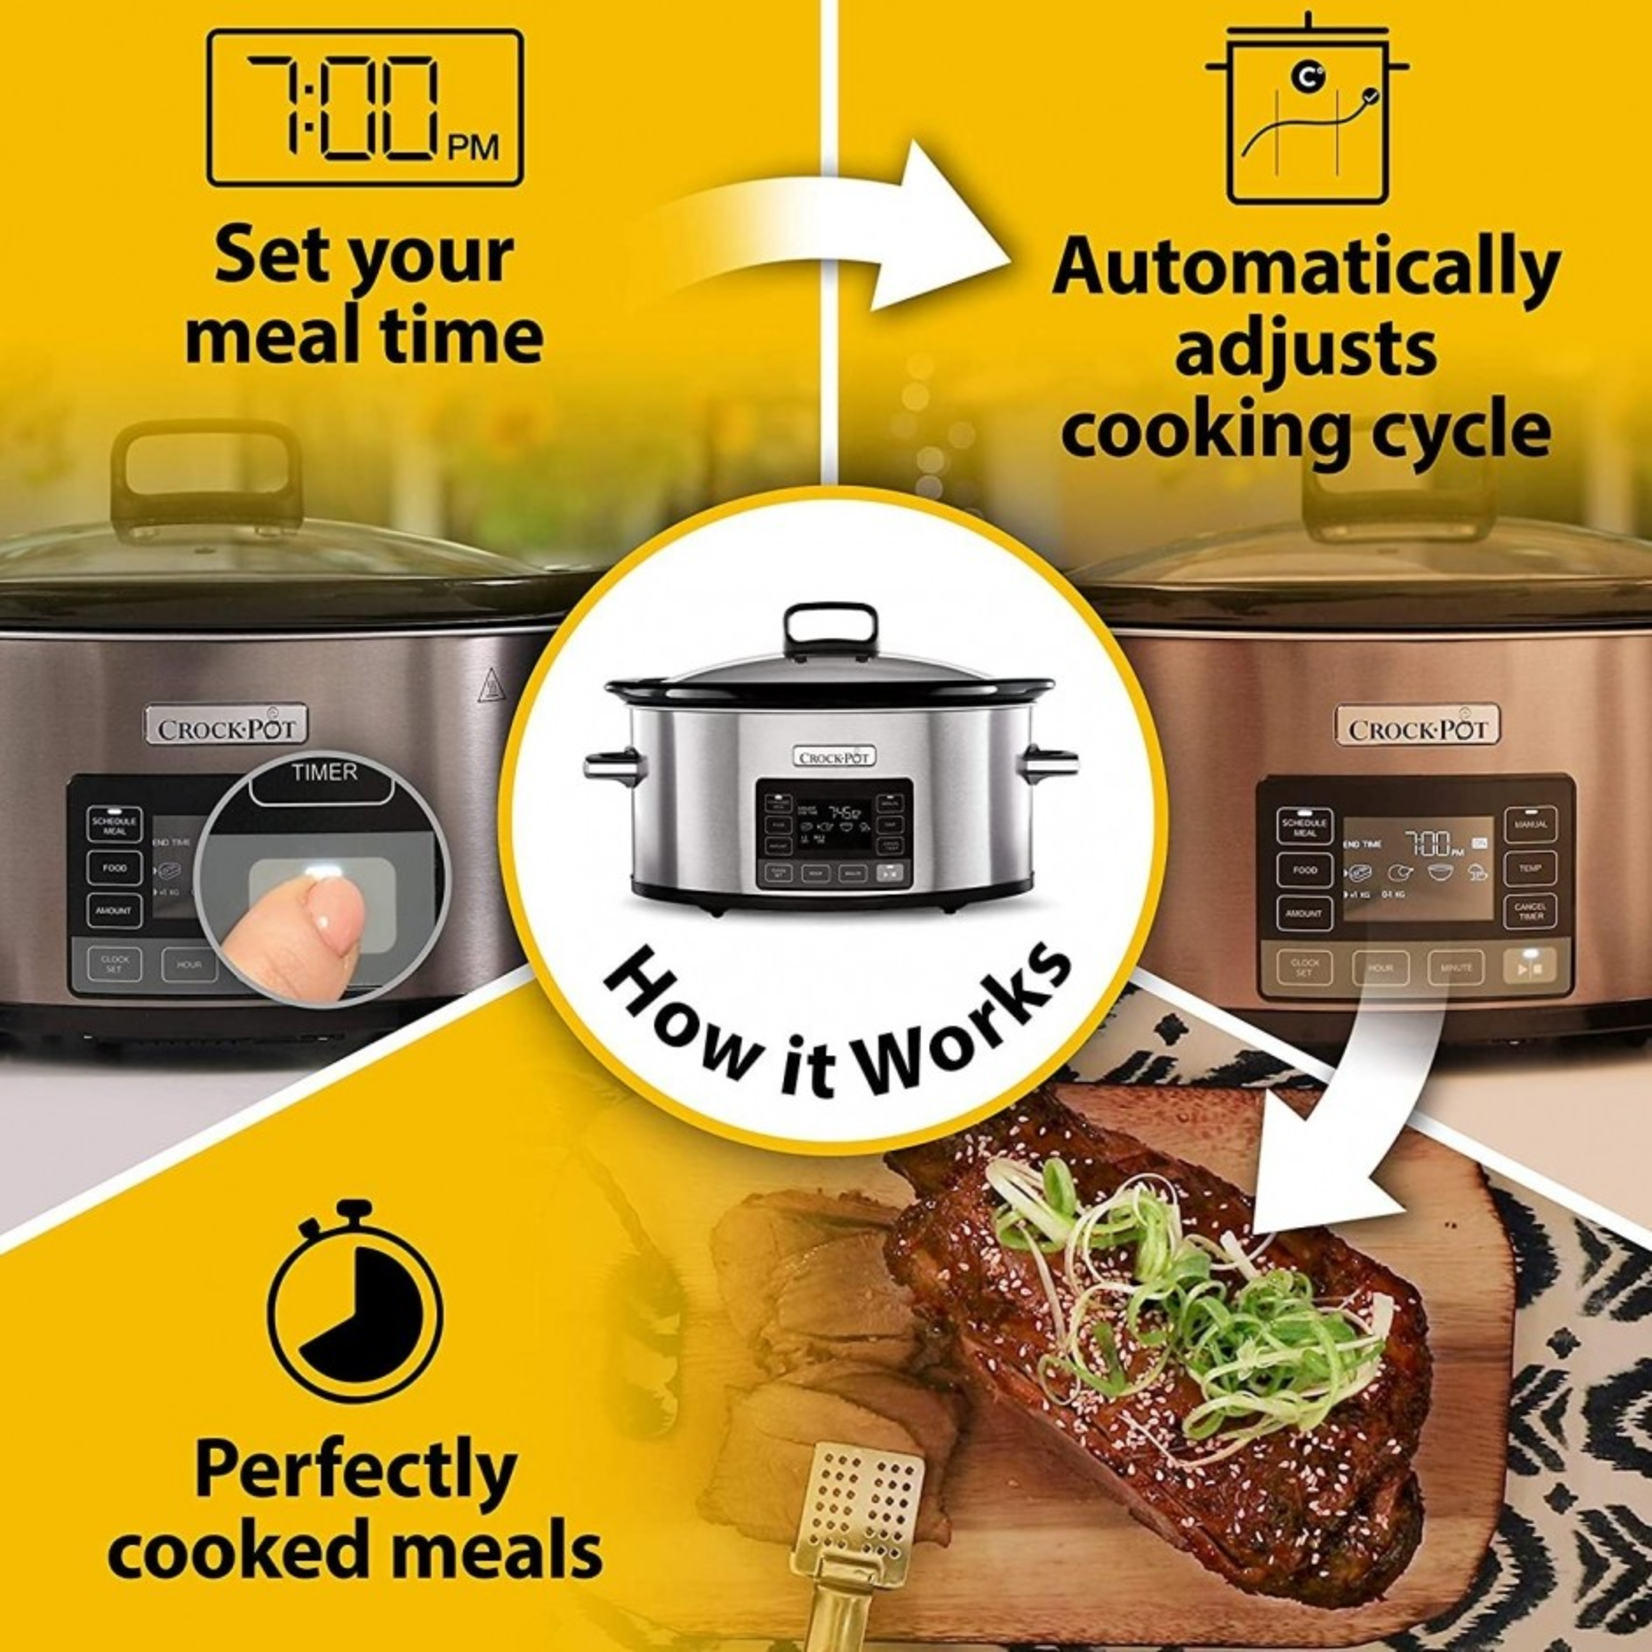 Crock-Pot Crock-pot Slowcooker CR066  - Time Select functie